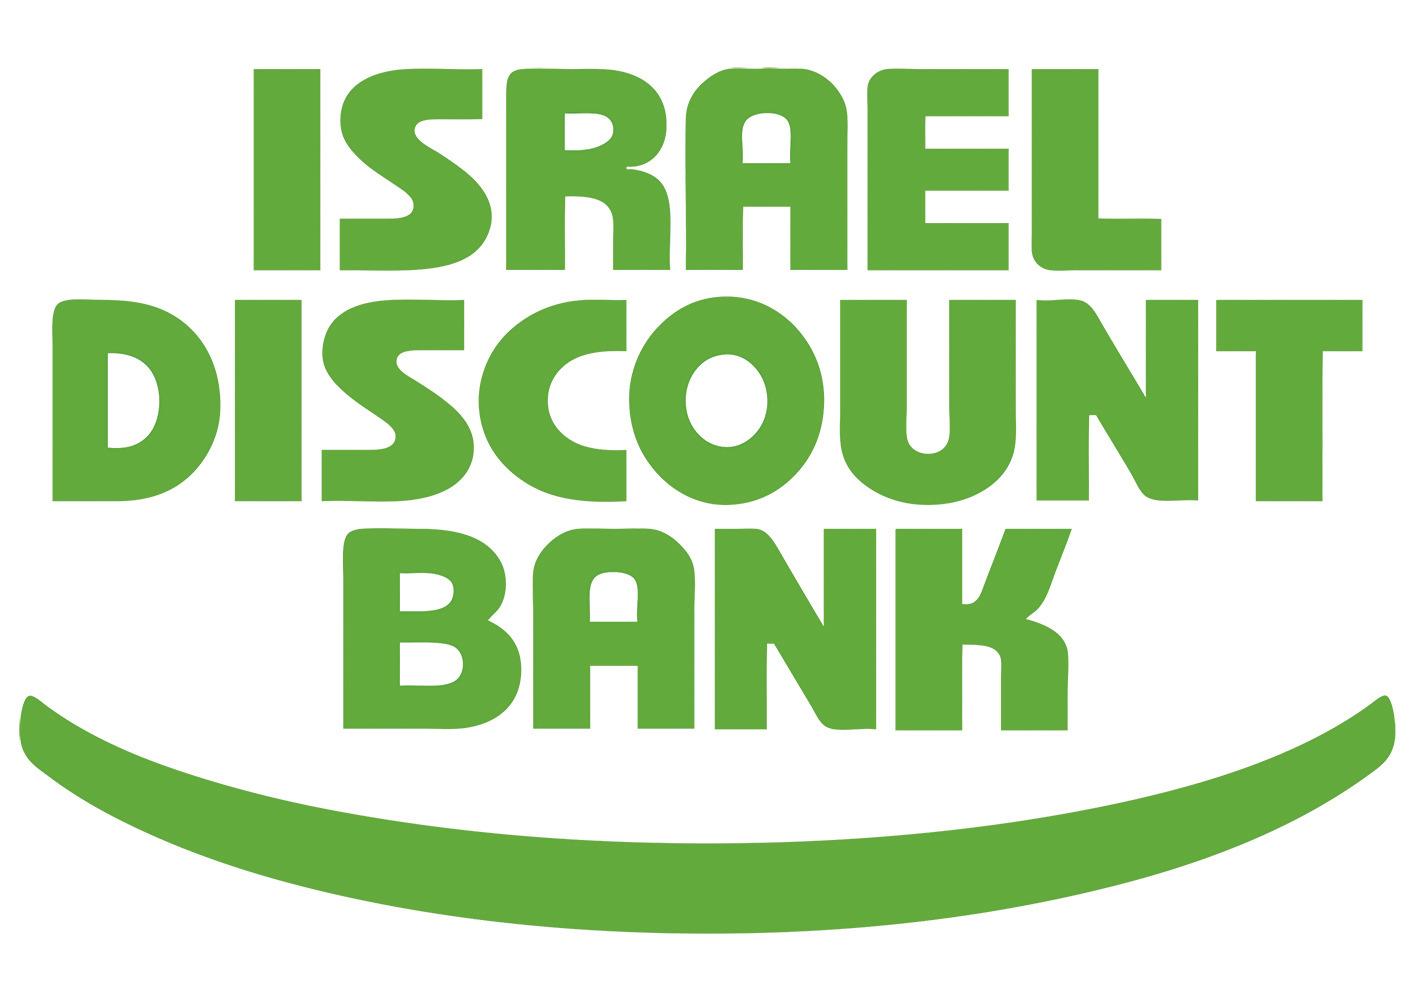 Israel Discount Bank